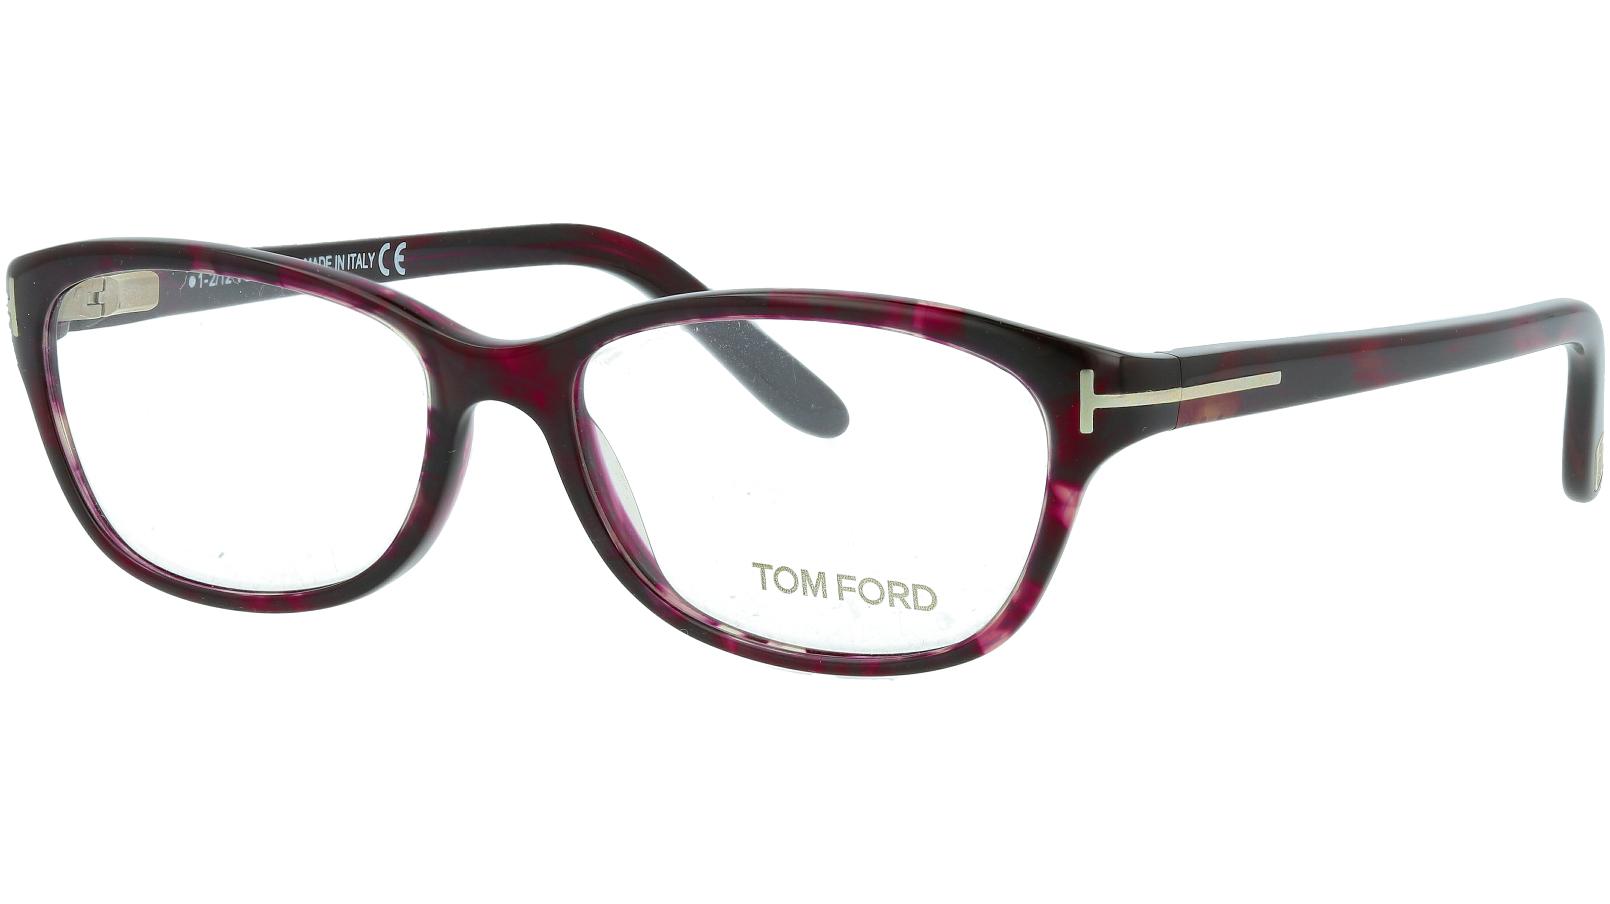 Tom Ford TF5142 083 52 VIOLET Glasses